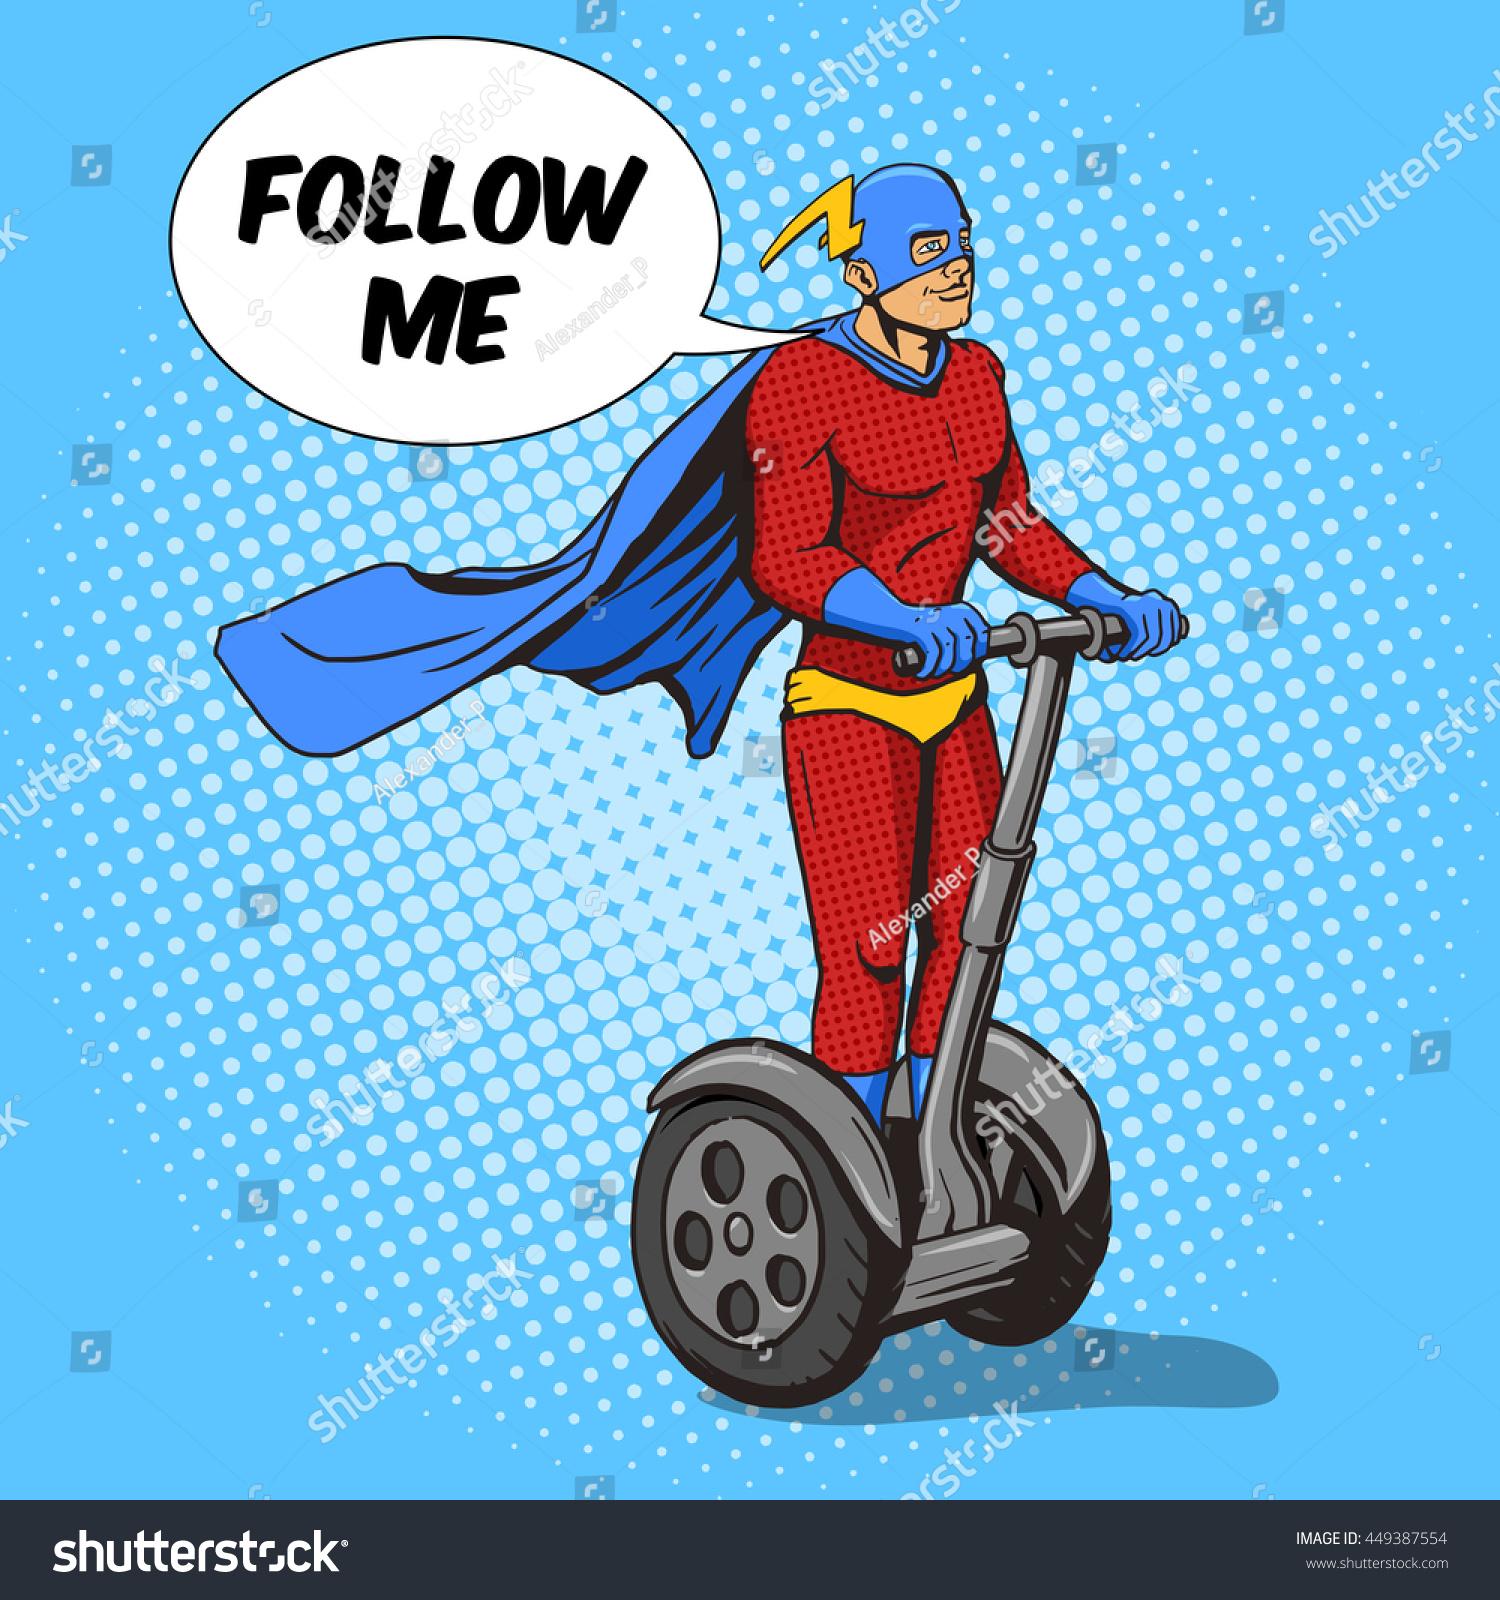 Superhero talks follow me and ride on two wheel electric transport Cartoon pop art vector illustration Human comic book vintage retro style